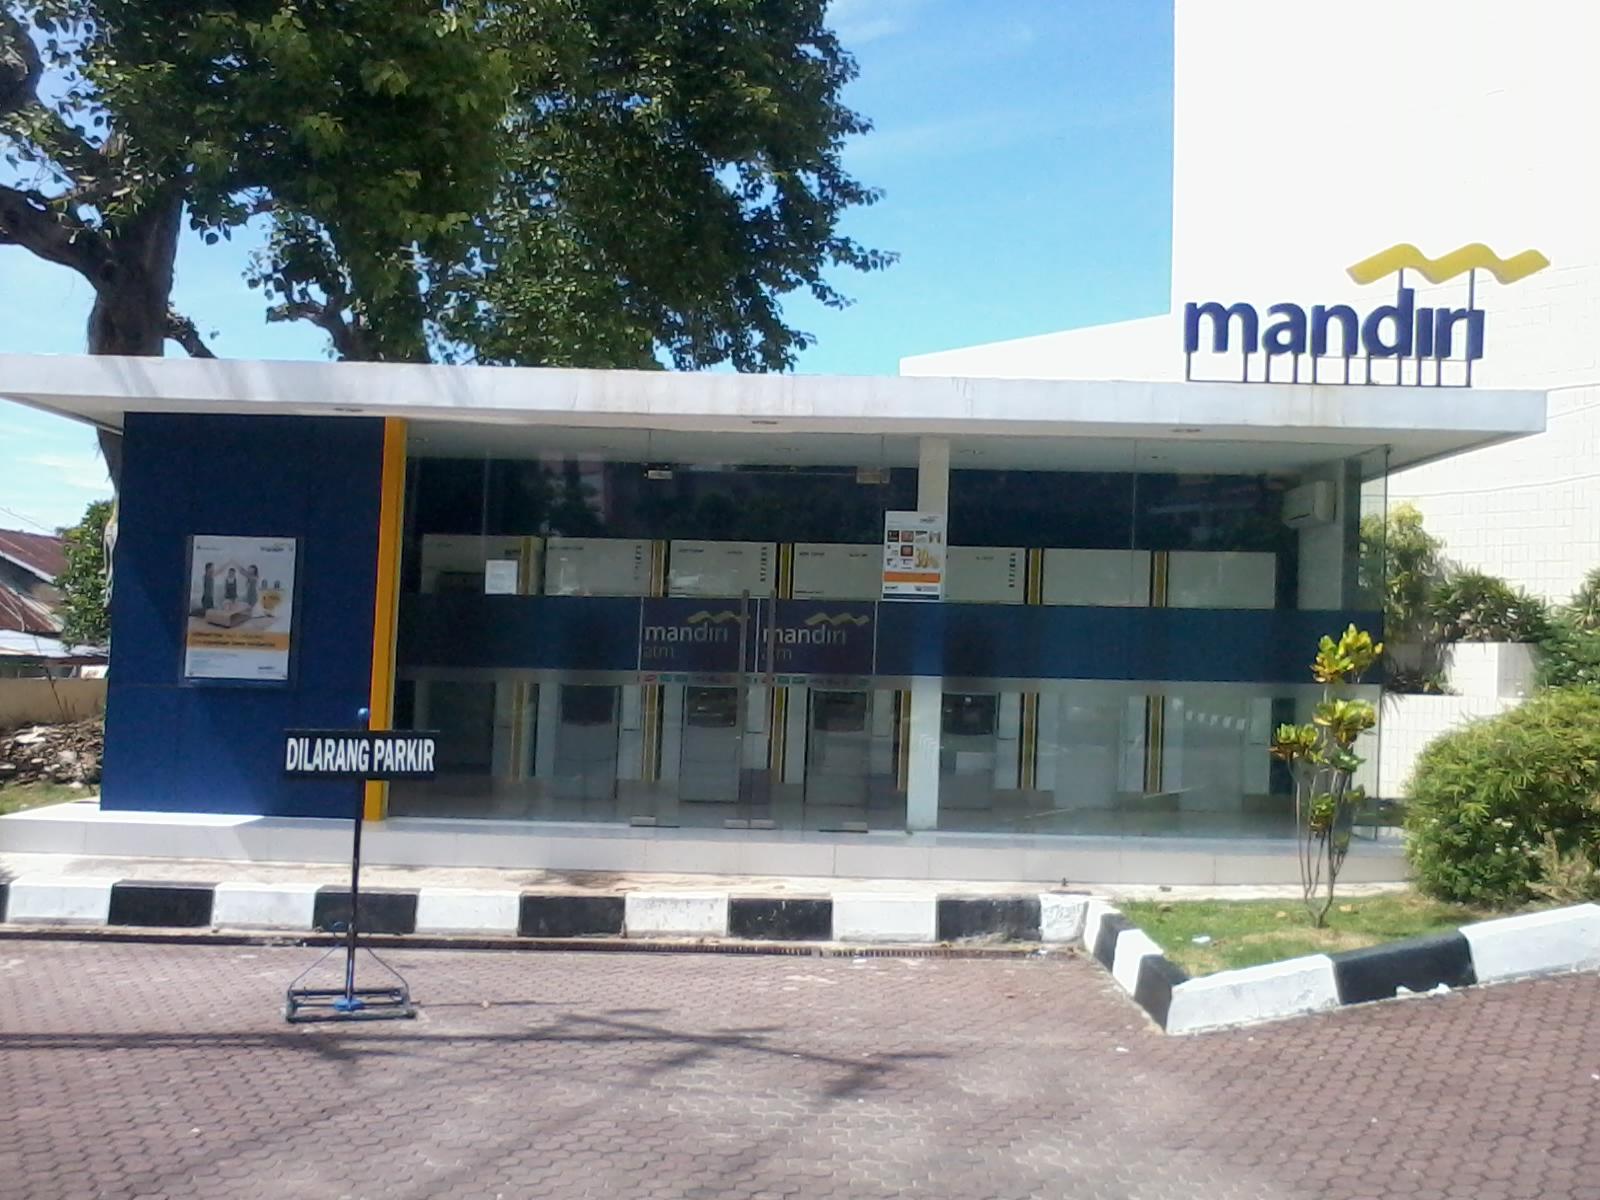 Lowongan Kerja Yogyakarta Januari 2013 Terbaru Portal Info Lowongan Kerja Terbaru Di Solo Raya Lowongan Kerja Bank Mandiri Info Lowongan Kerja Terbaru Dari Bank